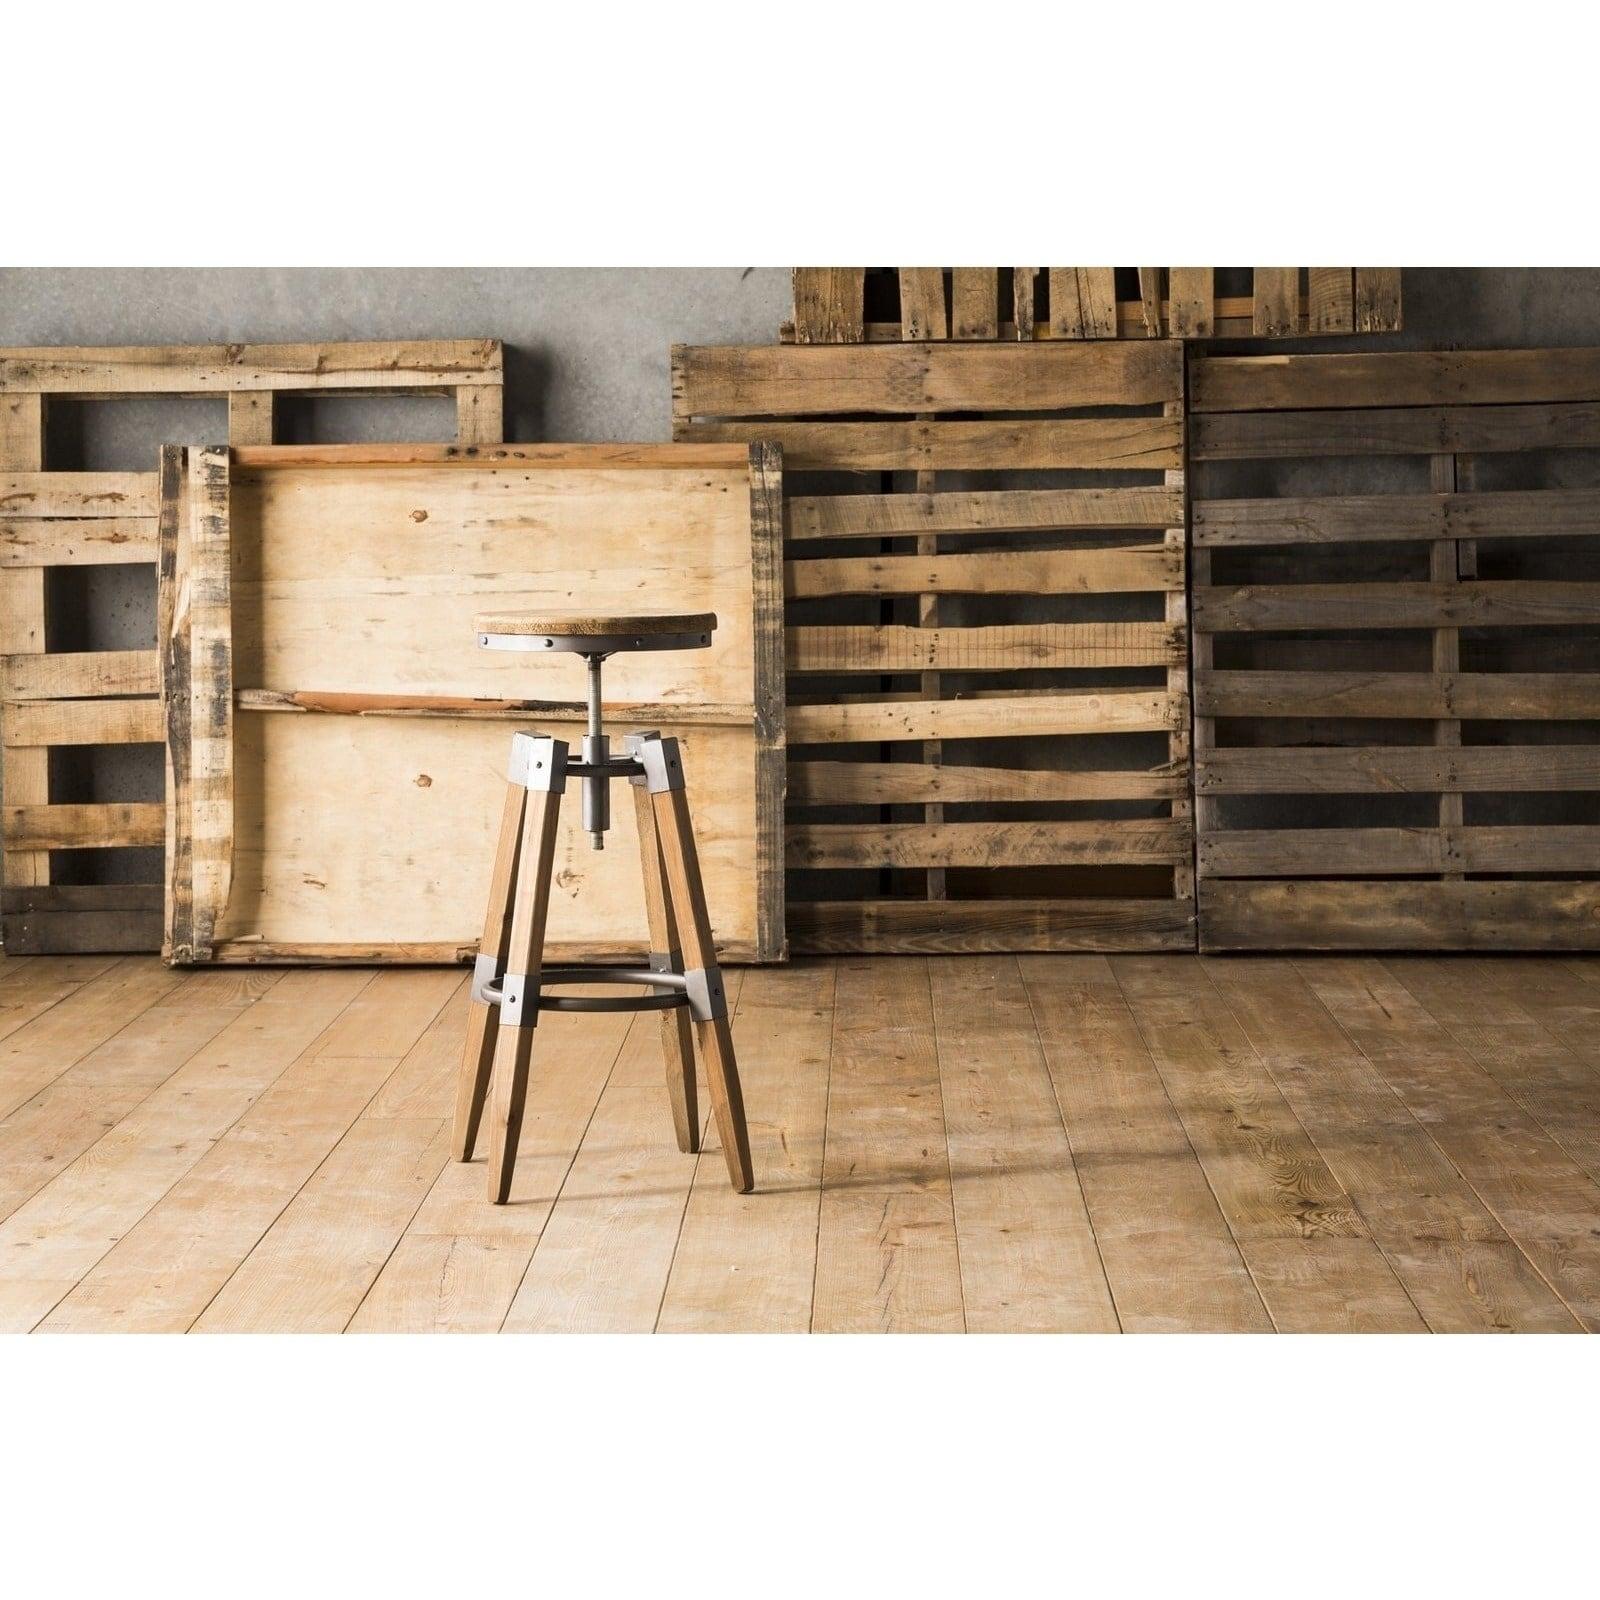 Pleasant Aurelle Home Industrial Wood And Iron Adjustable Bar Stool Inzonedesignstudio Interior Chair Design Inzonedesignstudiocom